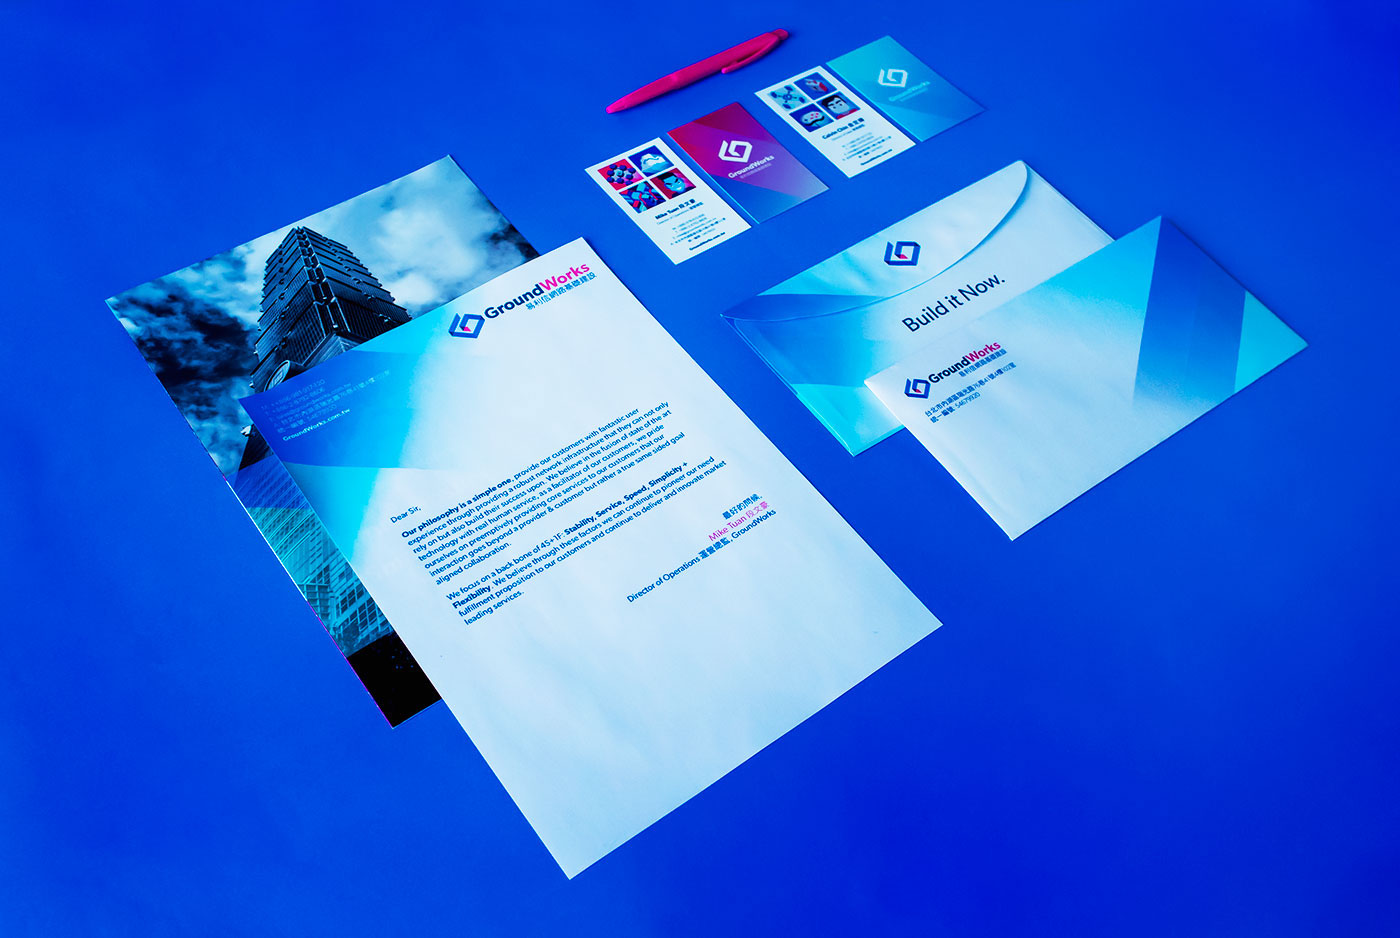 tech brand groundworks taiwan asia Stationery Website Web icons logo Logo Design logos corporate branding